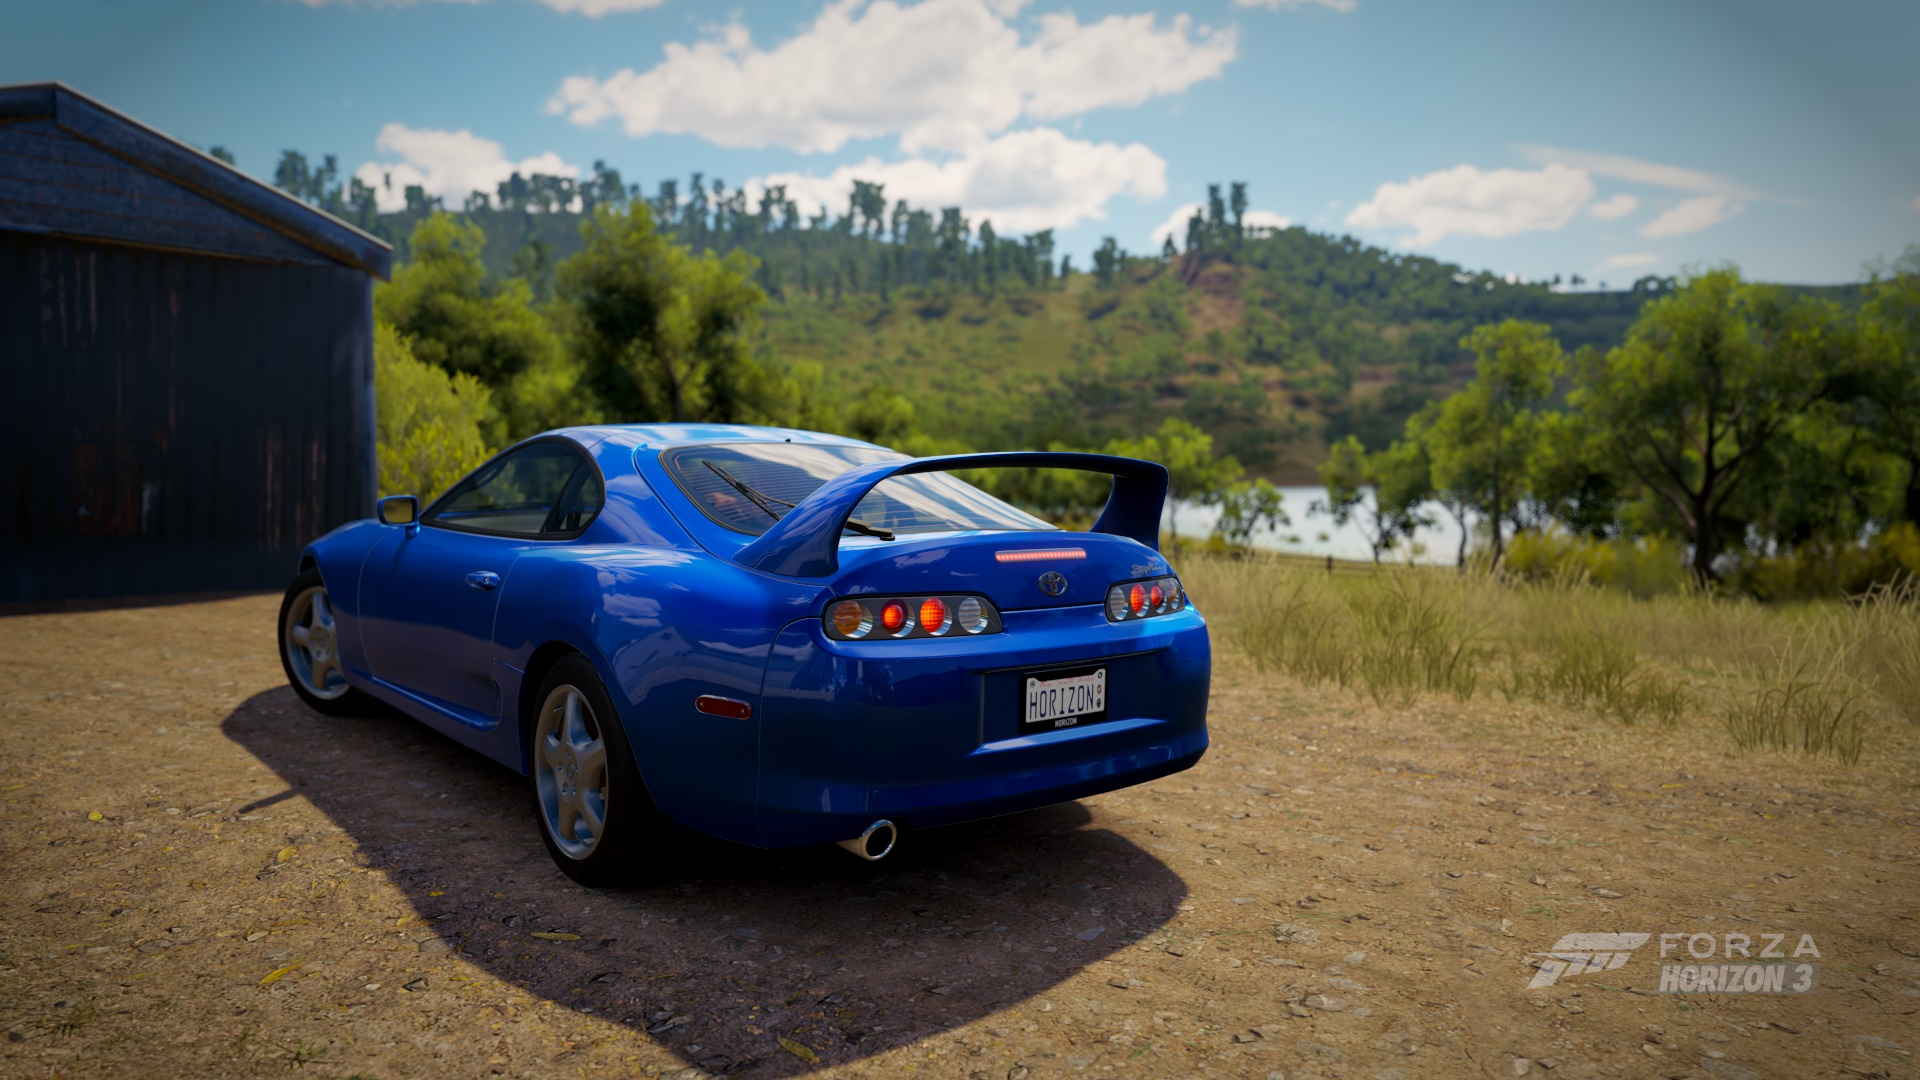 Toyota Supra returns to street racing in Forza Horizon 4